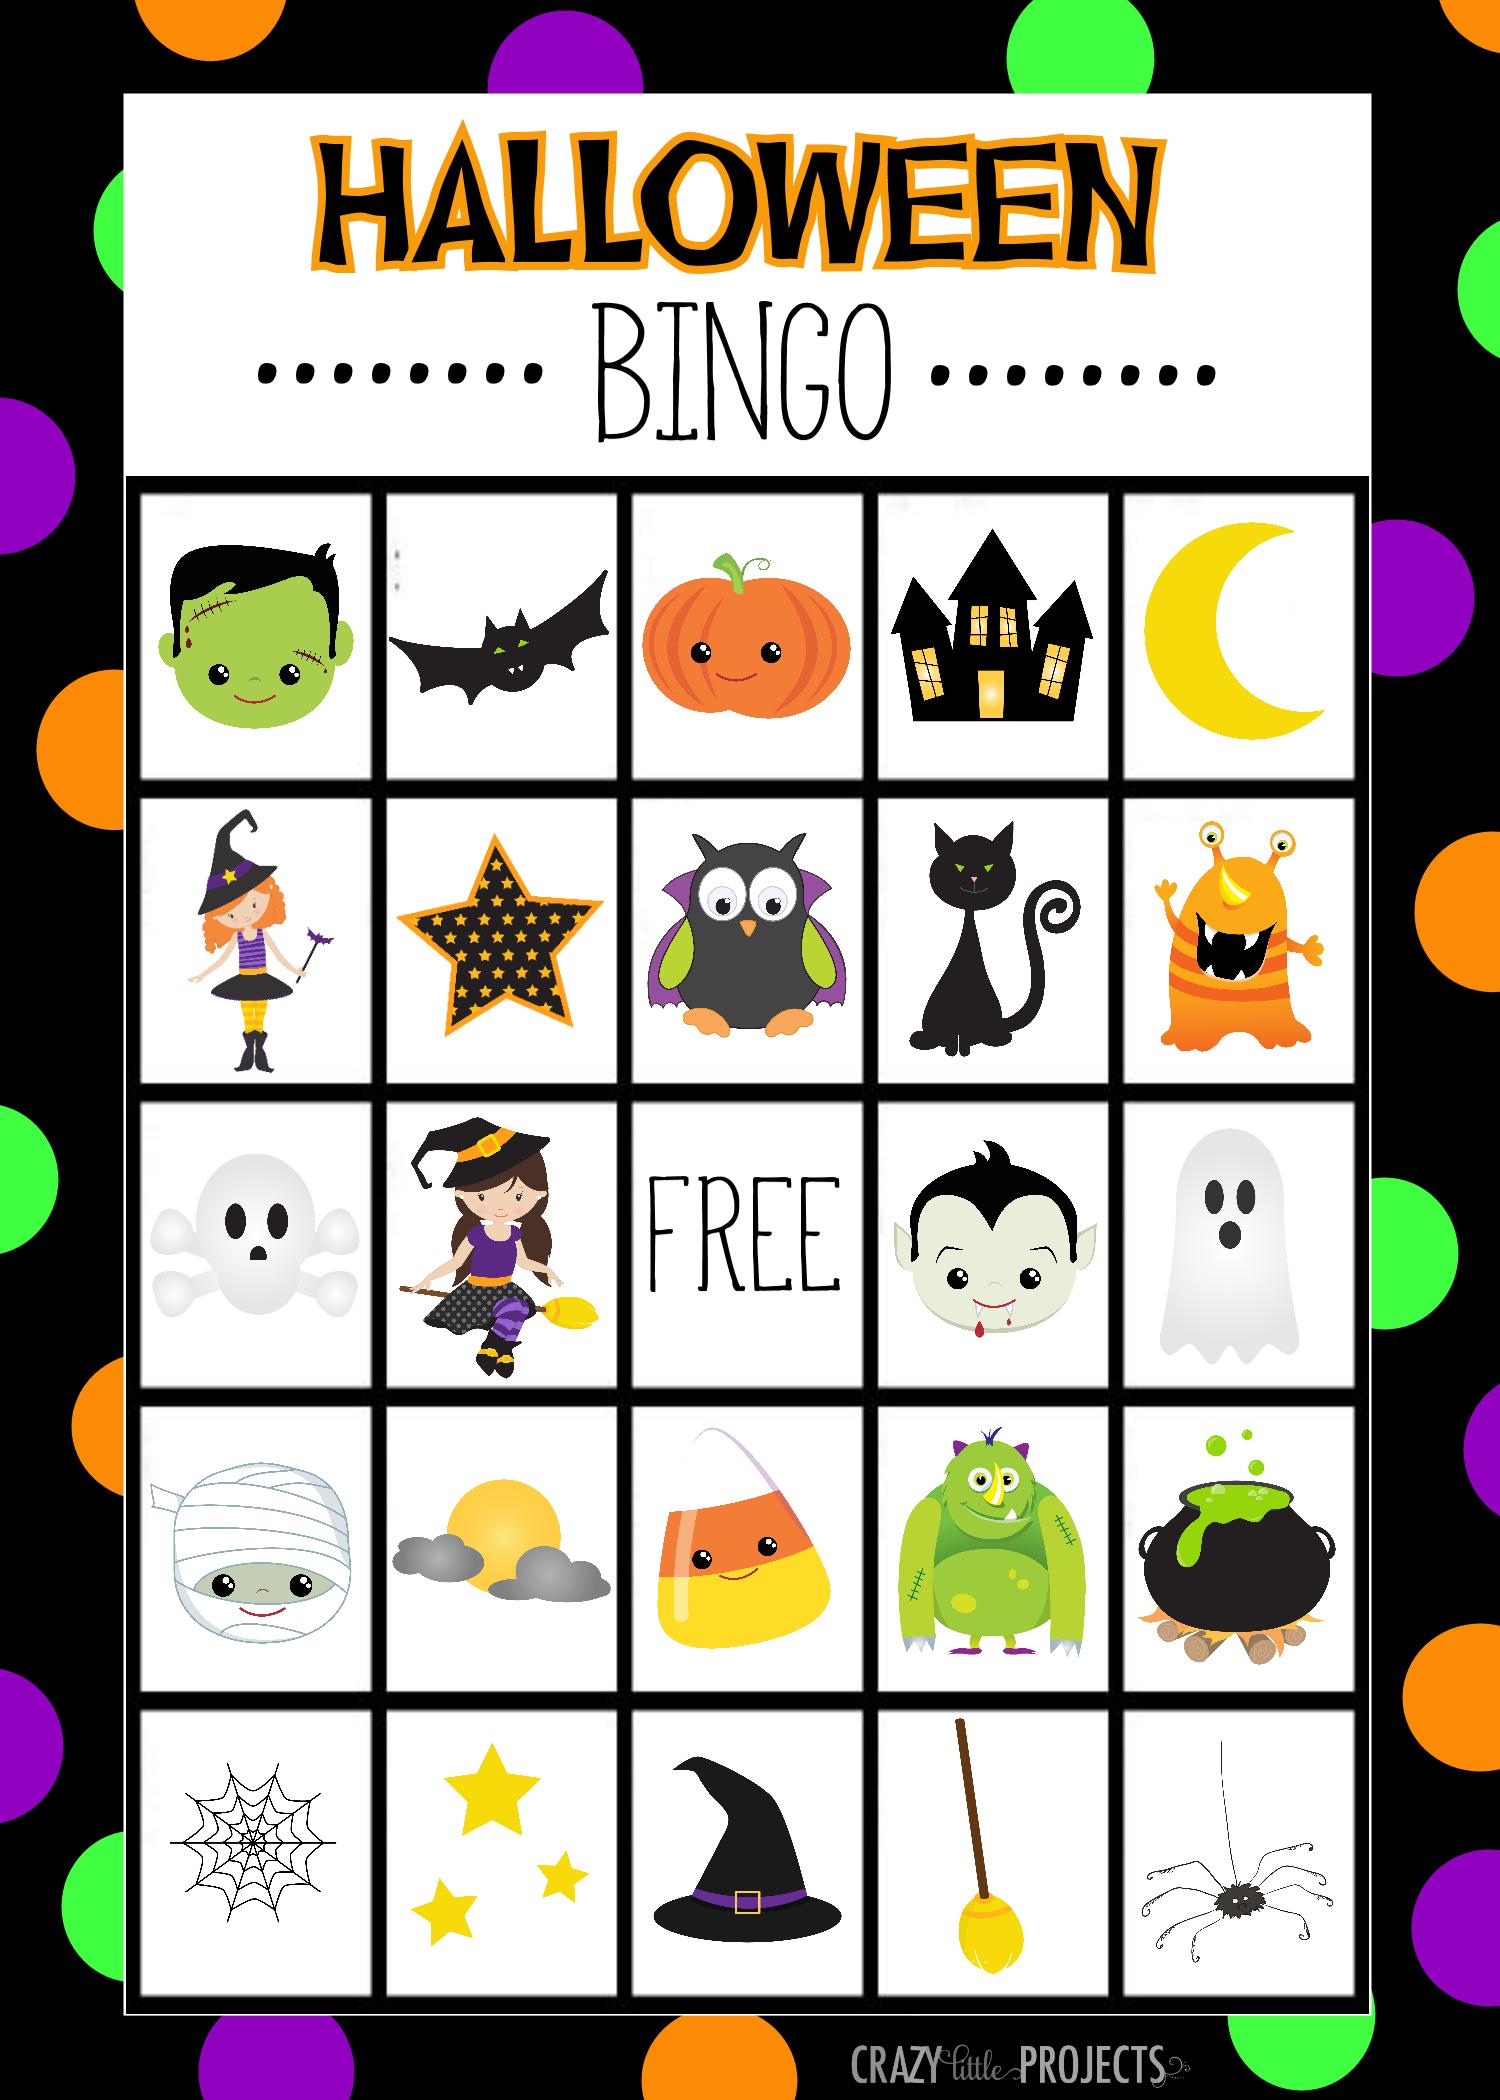 Halloween Bingo - Cute Free Printable Game   Halloween   Pinterest - Free Printable Halloween Bingo Cards